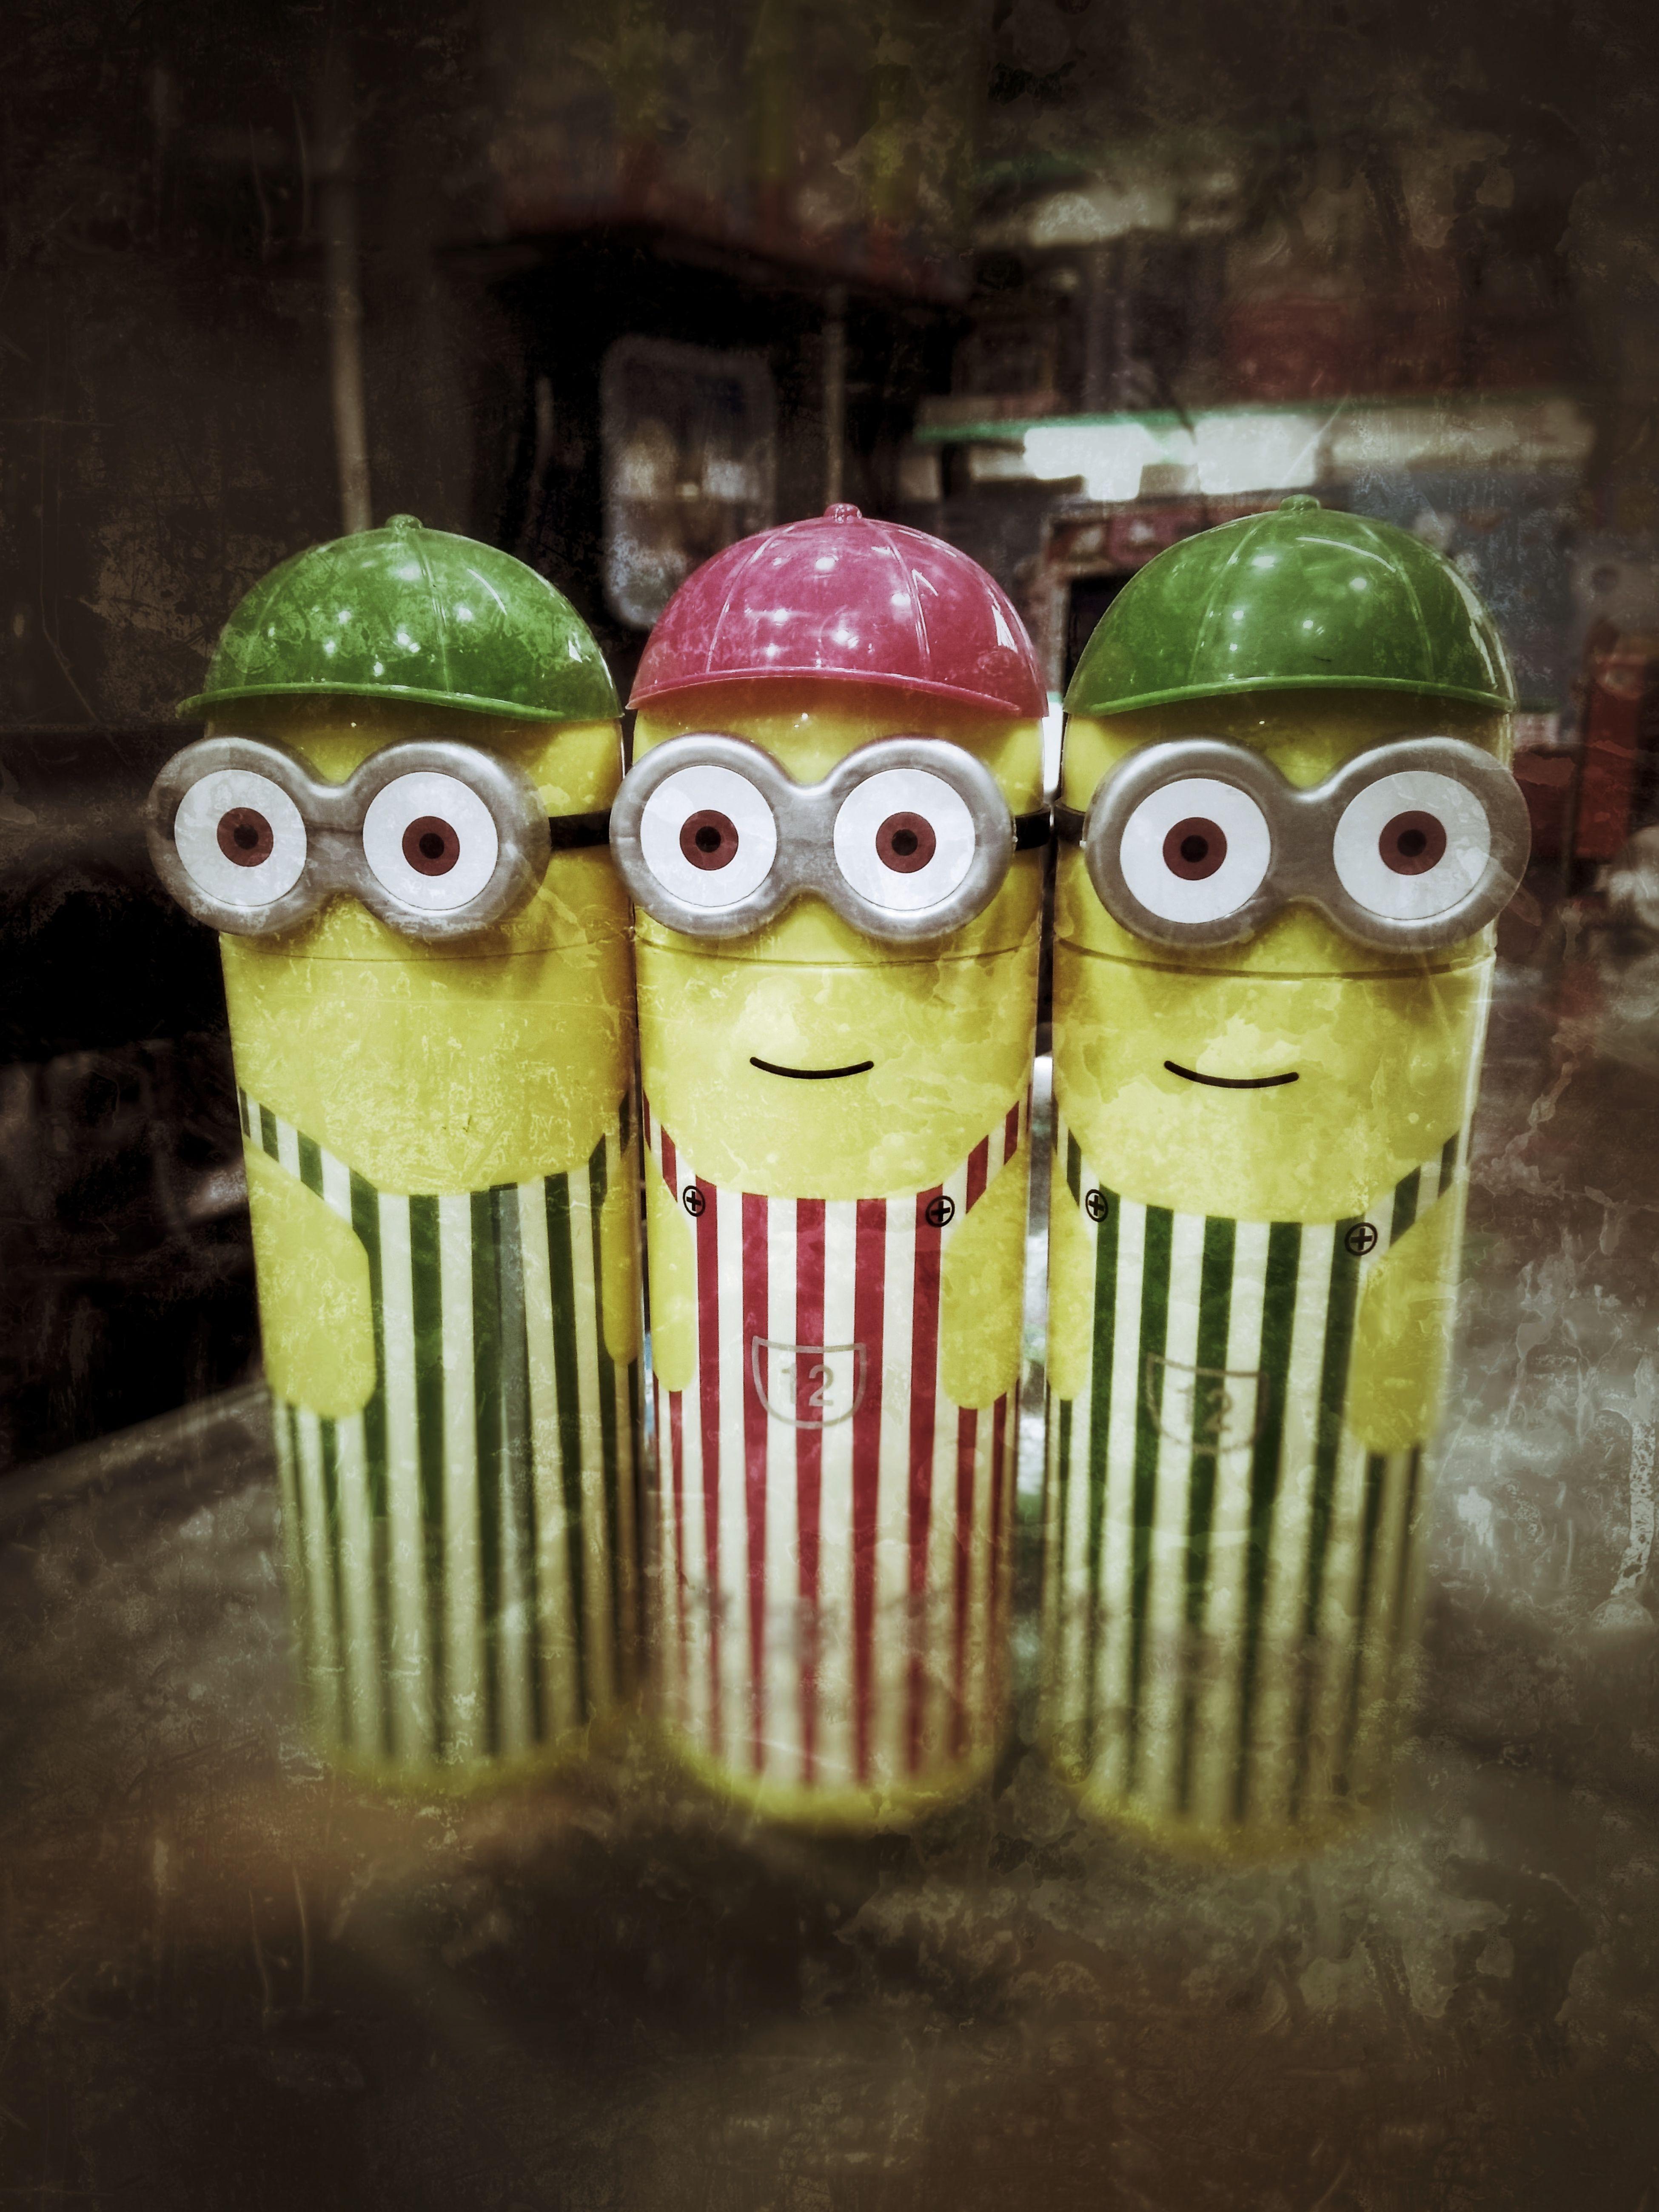 Bananatalk Bananas Banana Split Love To Take Photos ❤ Perfection❤❤❤ Creativity anthropomorphic face Love To Take Photos Portrait HandMadeToy Handmade Crafts No People Caps Boldeyes